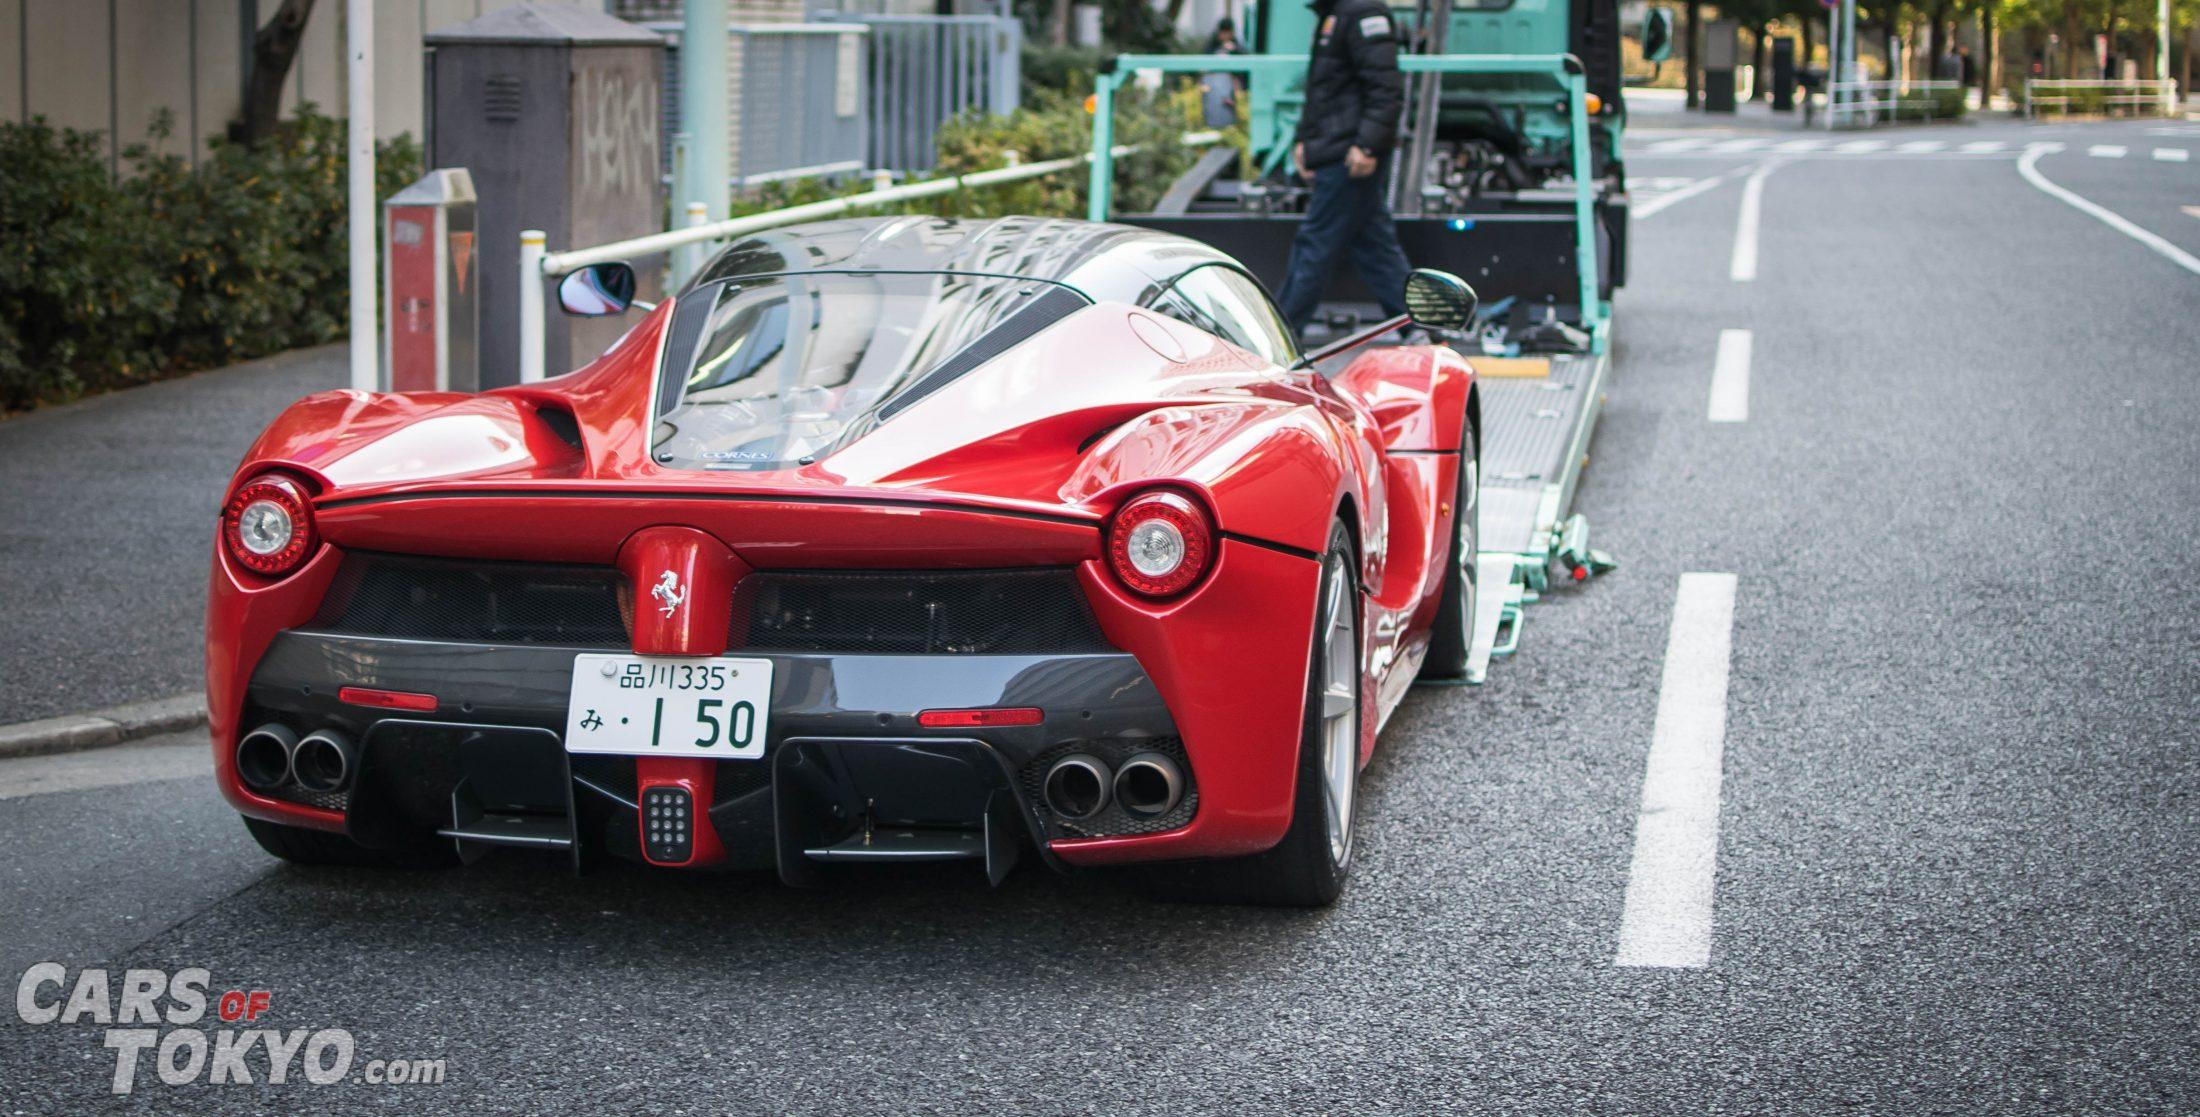 cars-of-tokyo-hypercars-laferrari